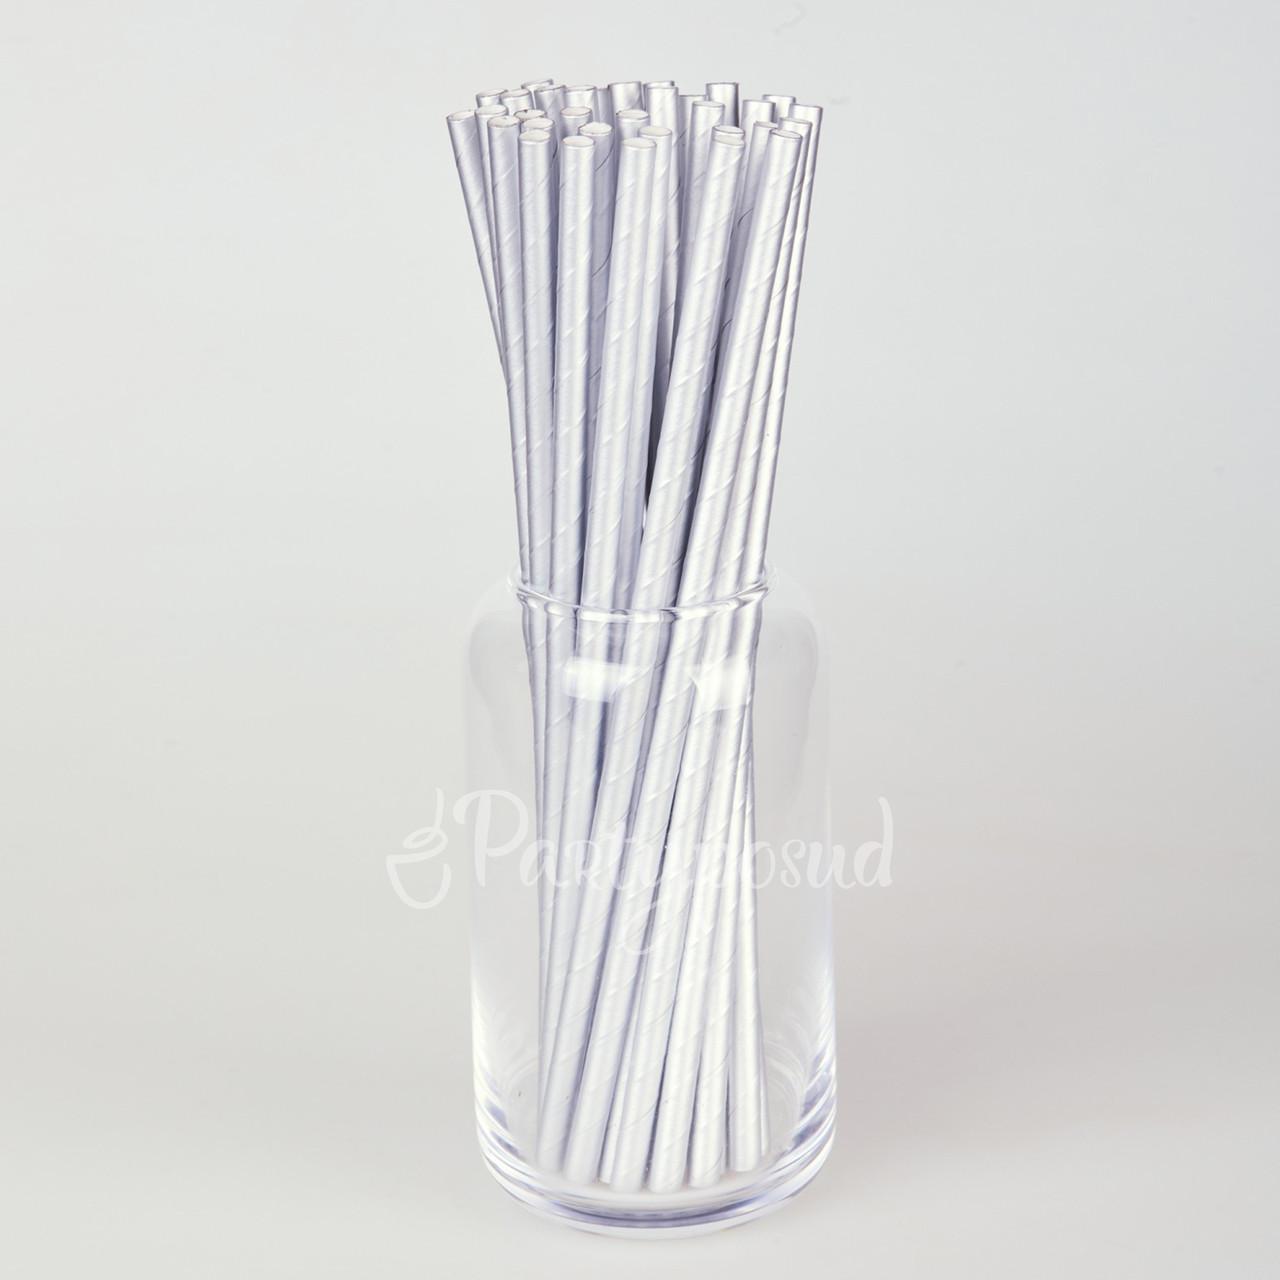 Трубочка бумажная серебряная